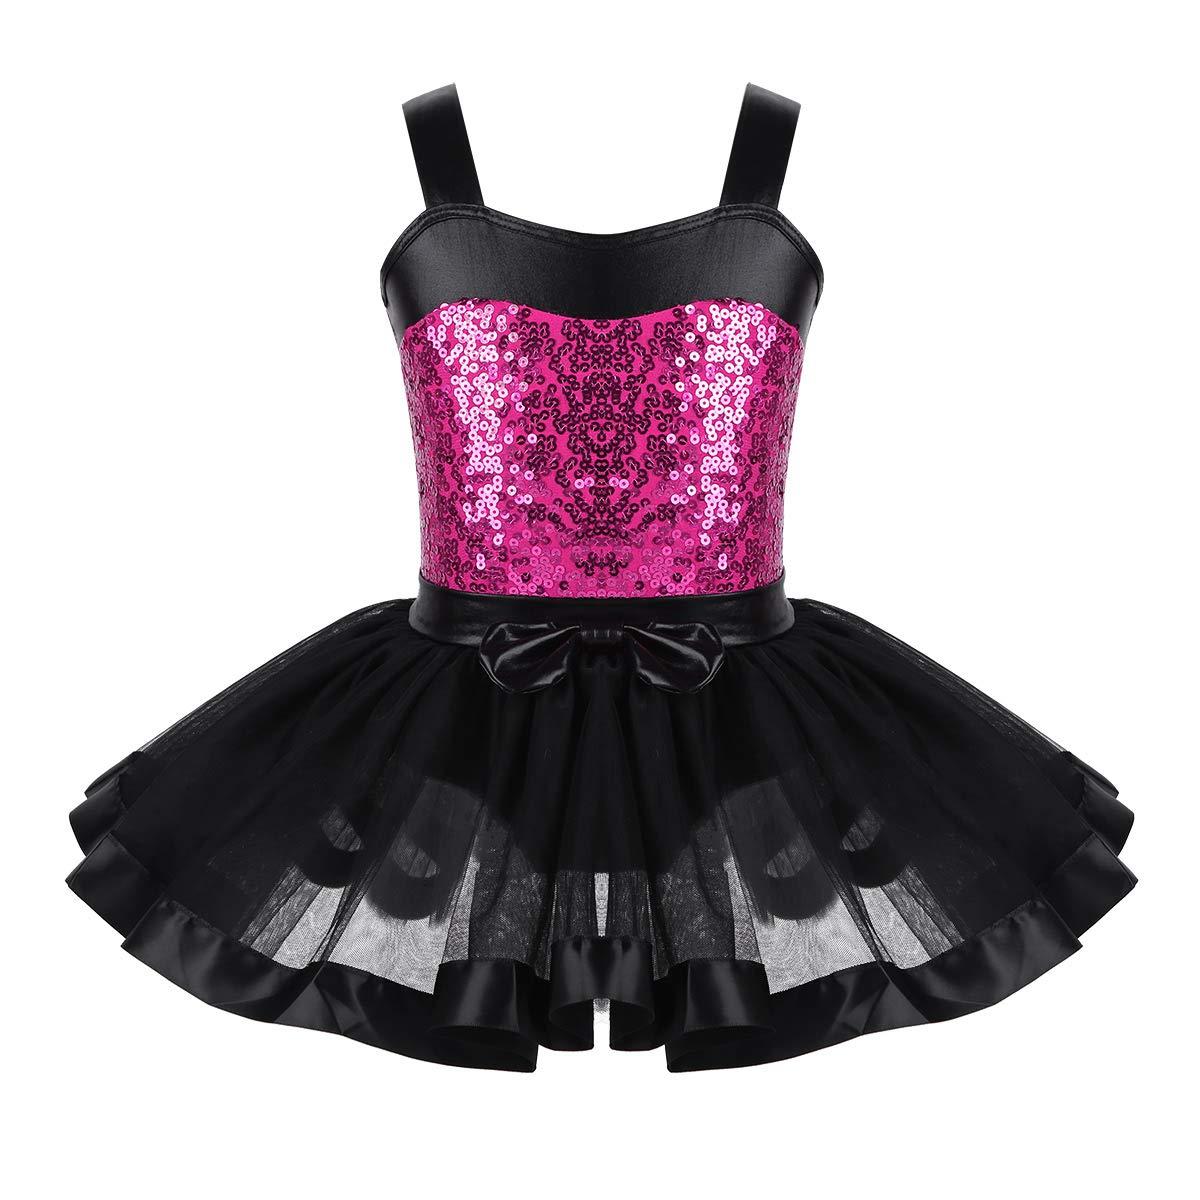 CHICTRY Girls Kids Basic Team Short Sleeved Wrap-Around Skirt Leotard Dance Ballet Tutu Dress